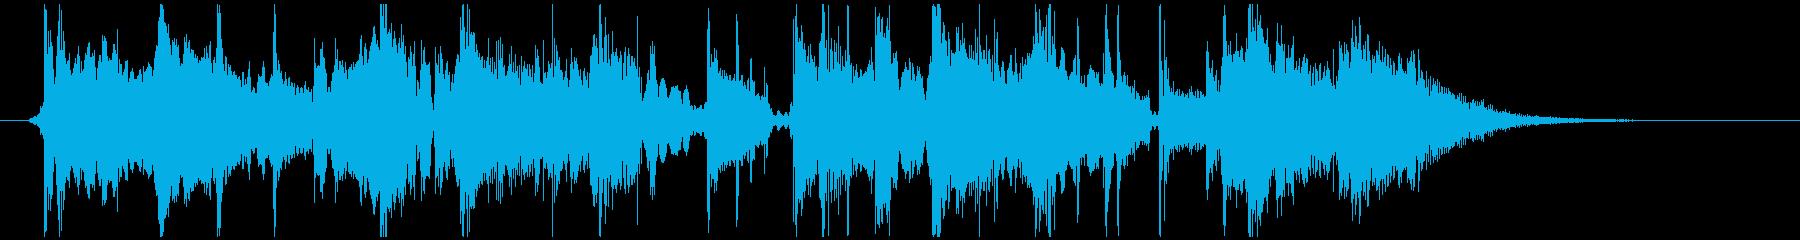 RnB系,ジングル,サウンドロゴなどにの再生済みの波形